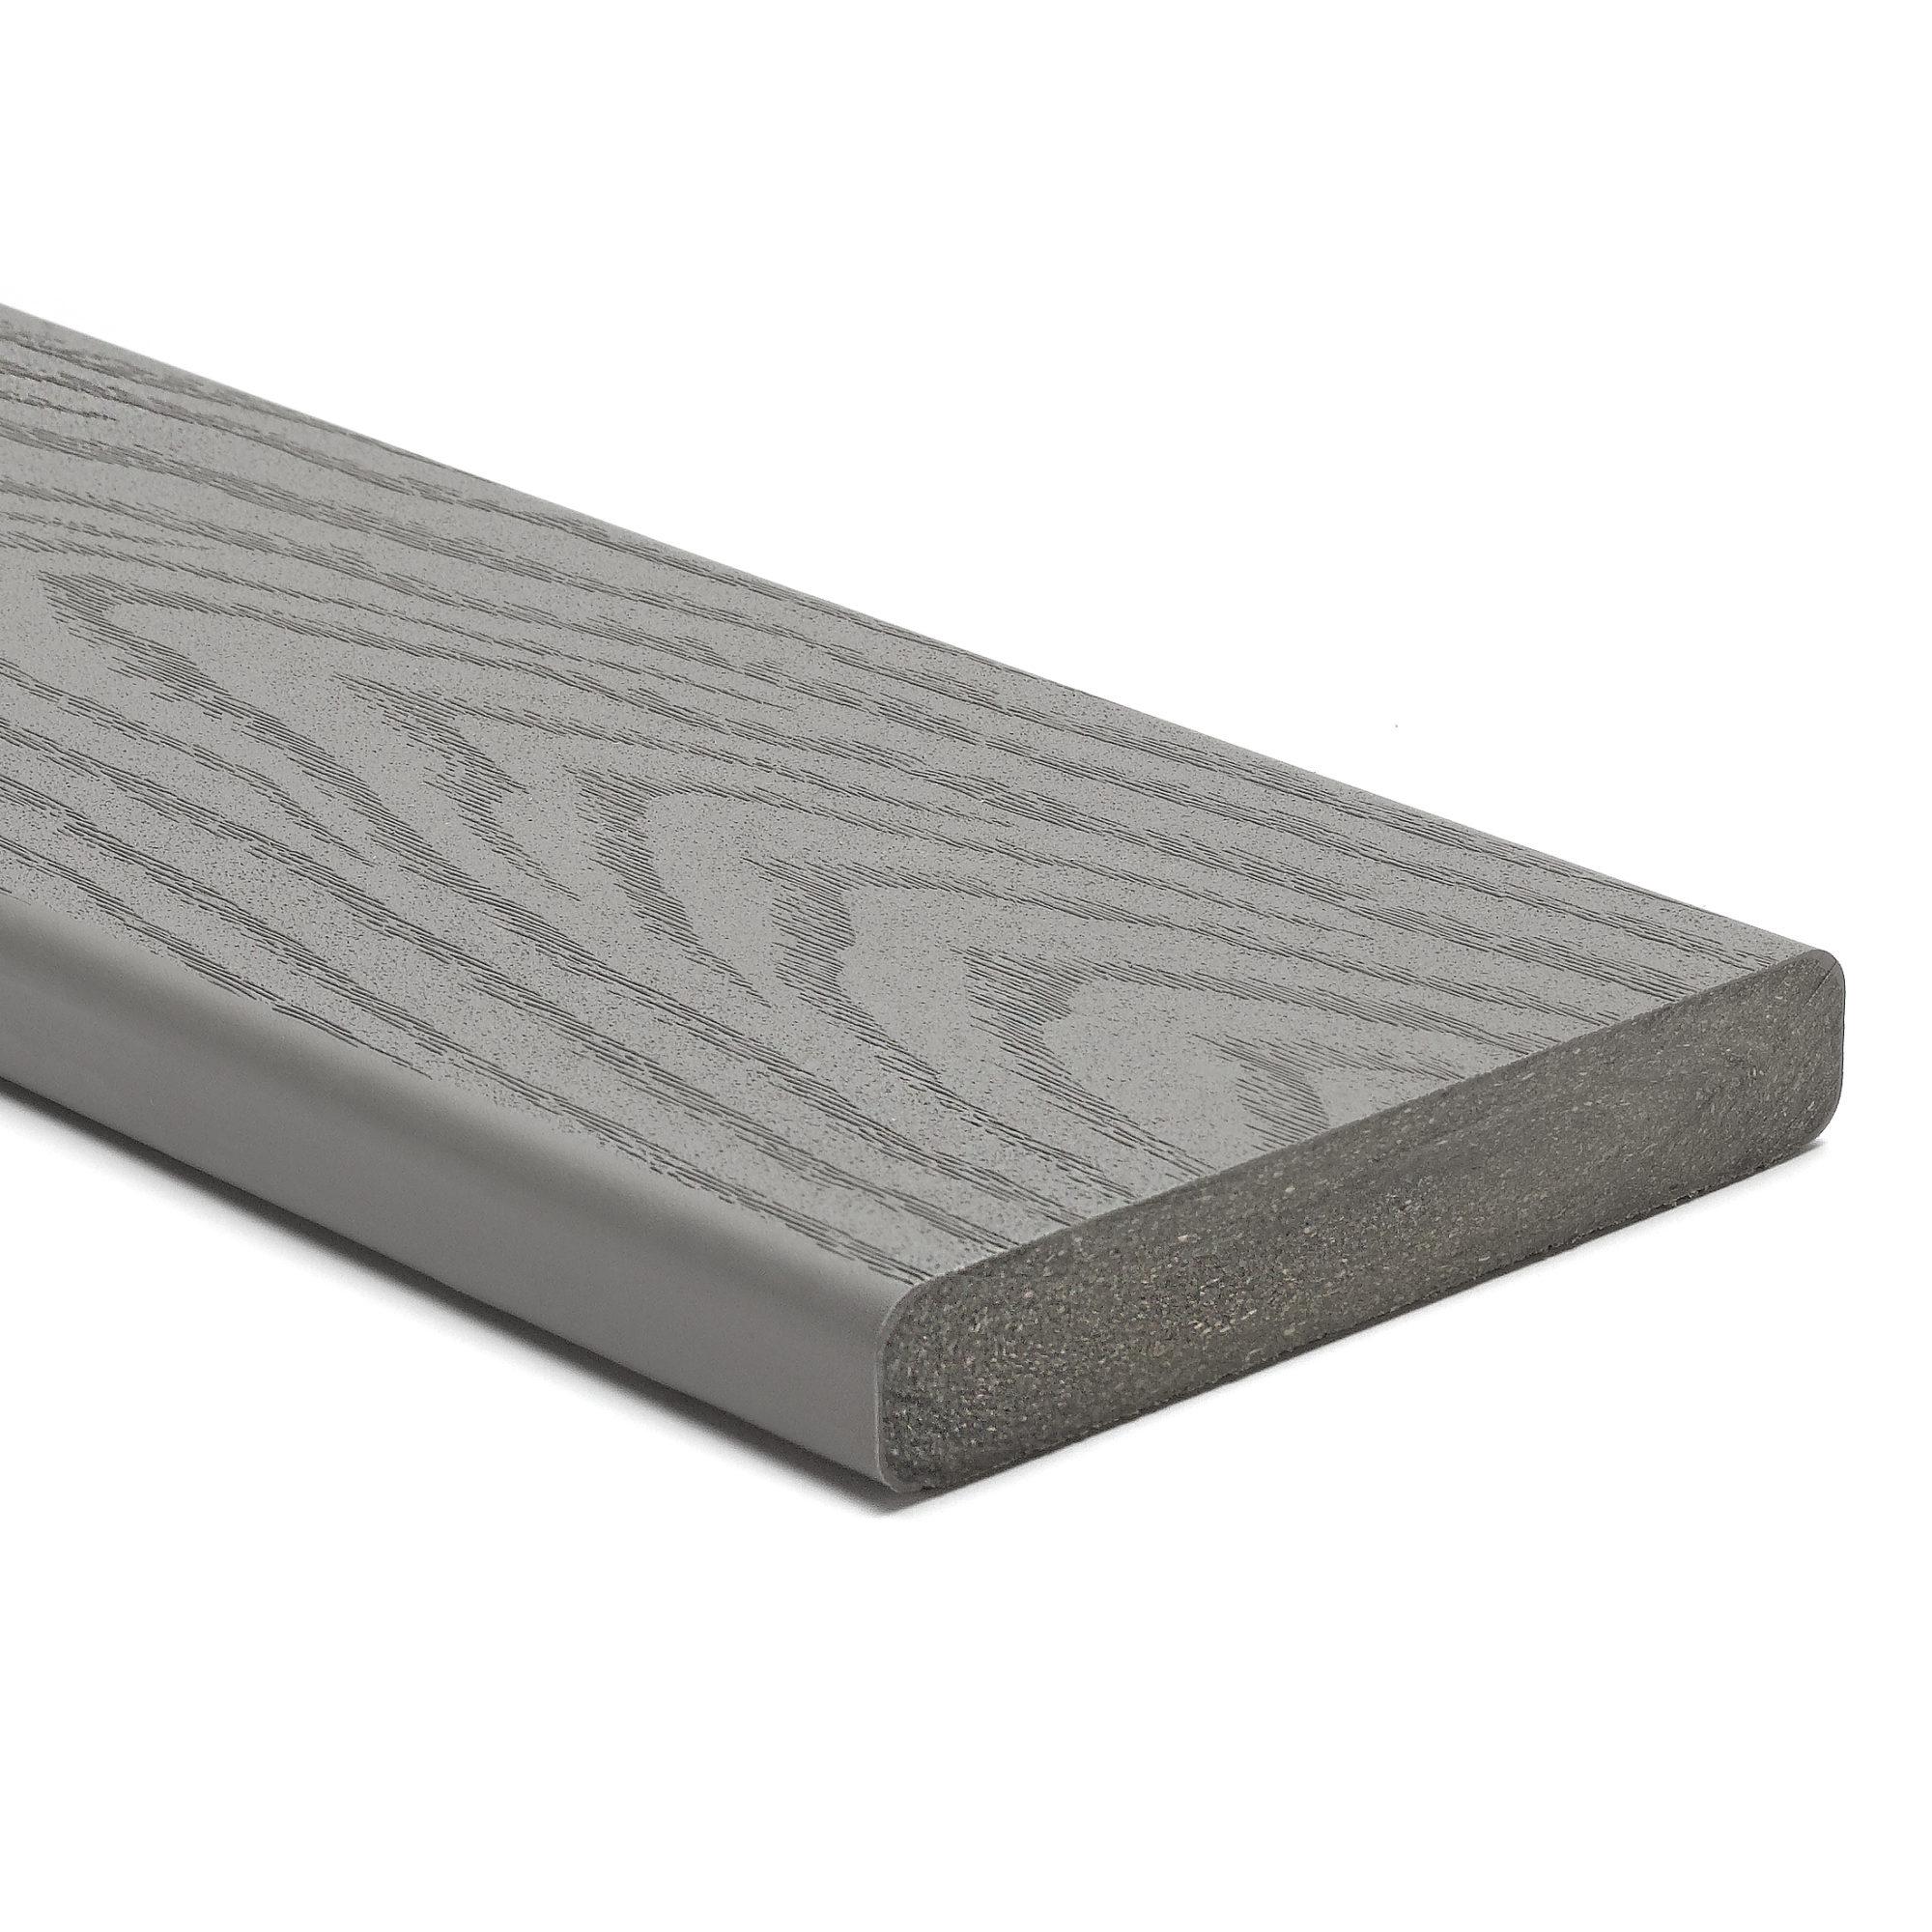 Trex Select Square Pebble Grey